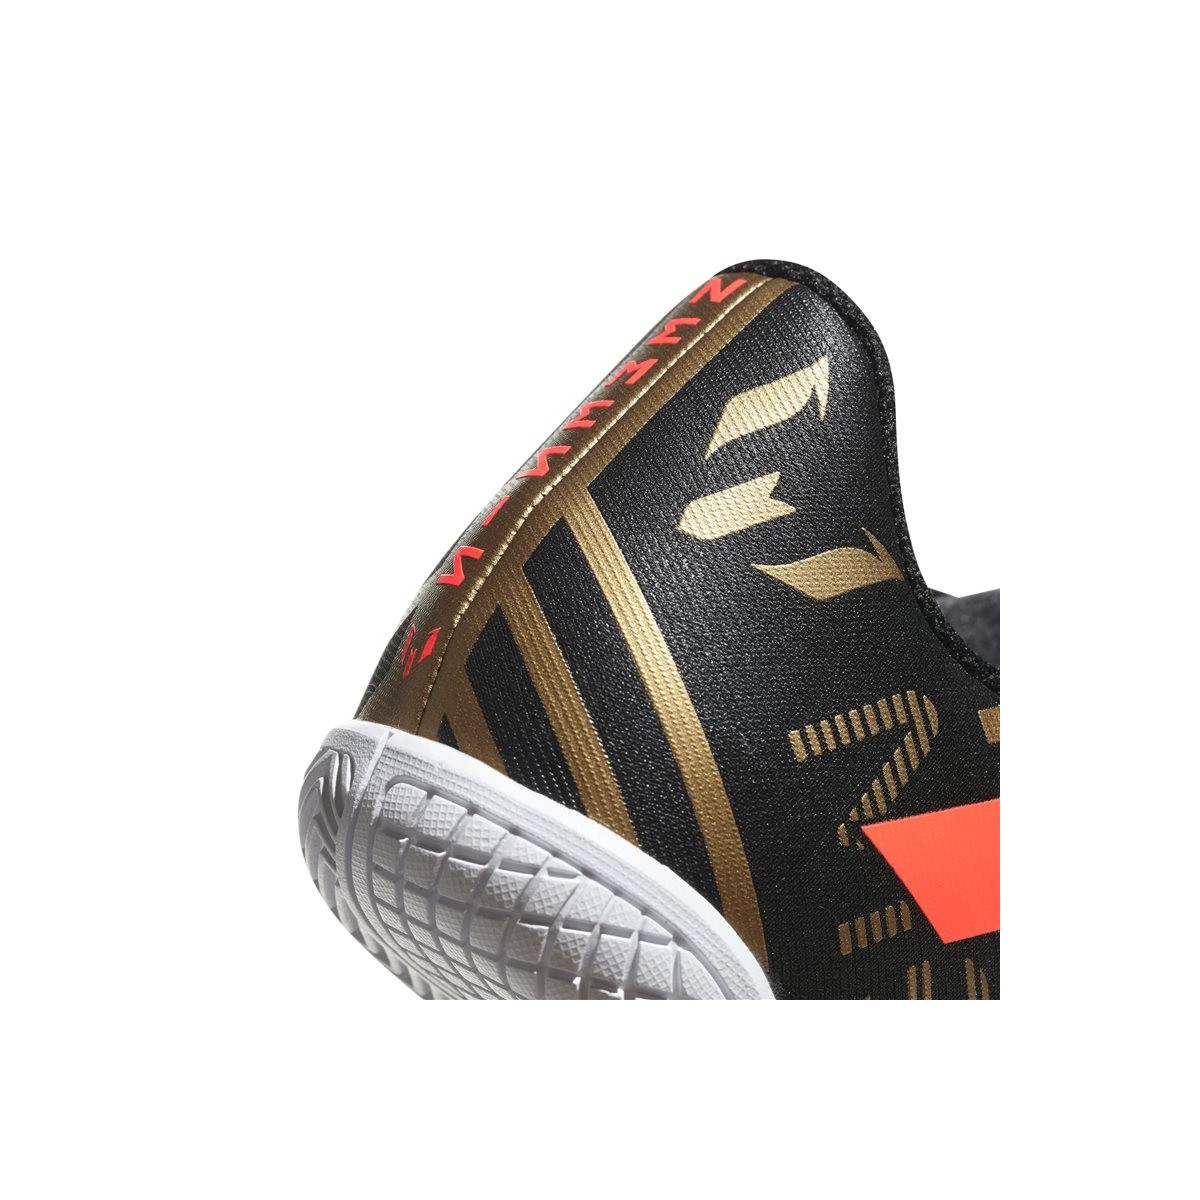 0639b41b7 ... Adidas Nemeziz Zapatilla Fútbol Sala Messi Tango 17.4 CP9224 Negras ...